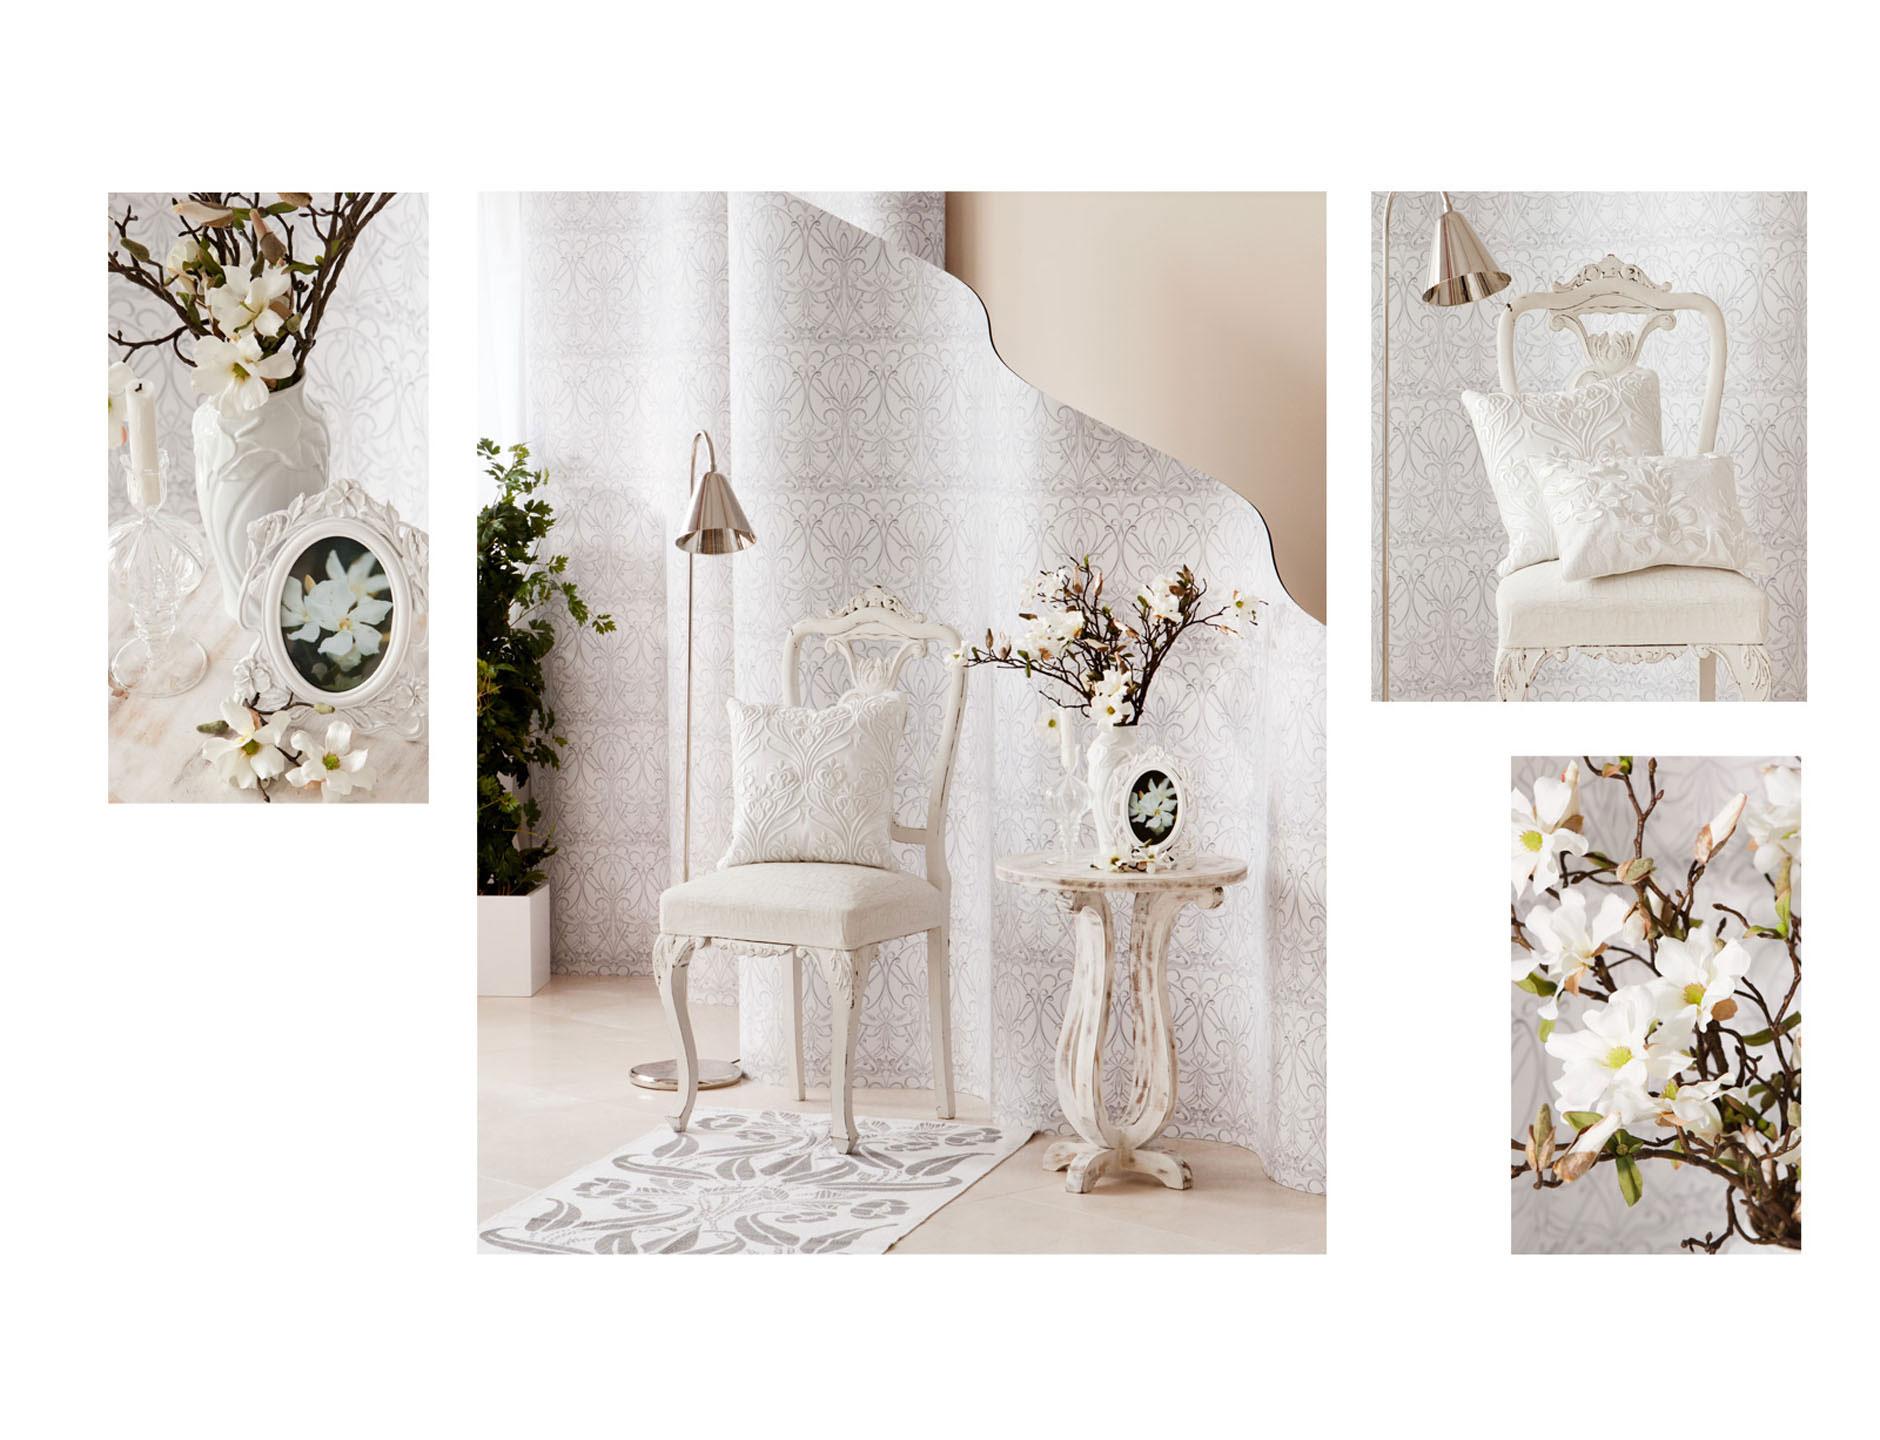 saldi zara home 2015 prezzi design mon amour. Black Bedroom Furniture Sets. Home Design Ideas